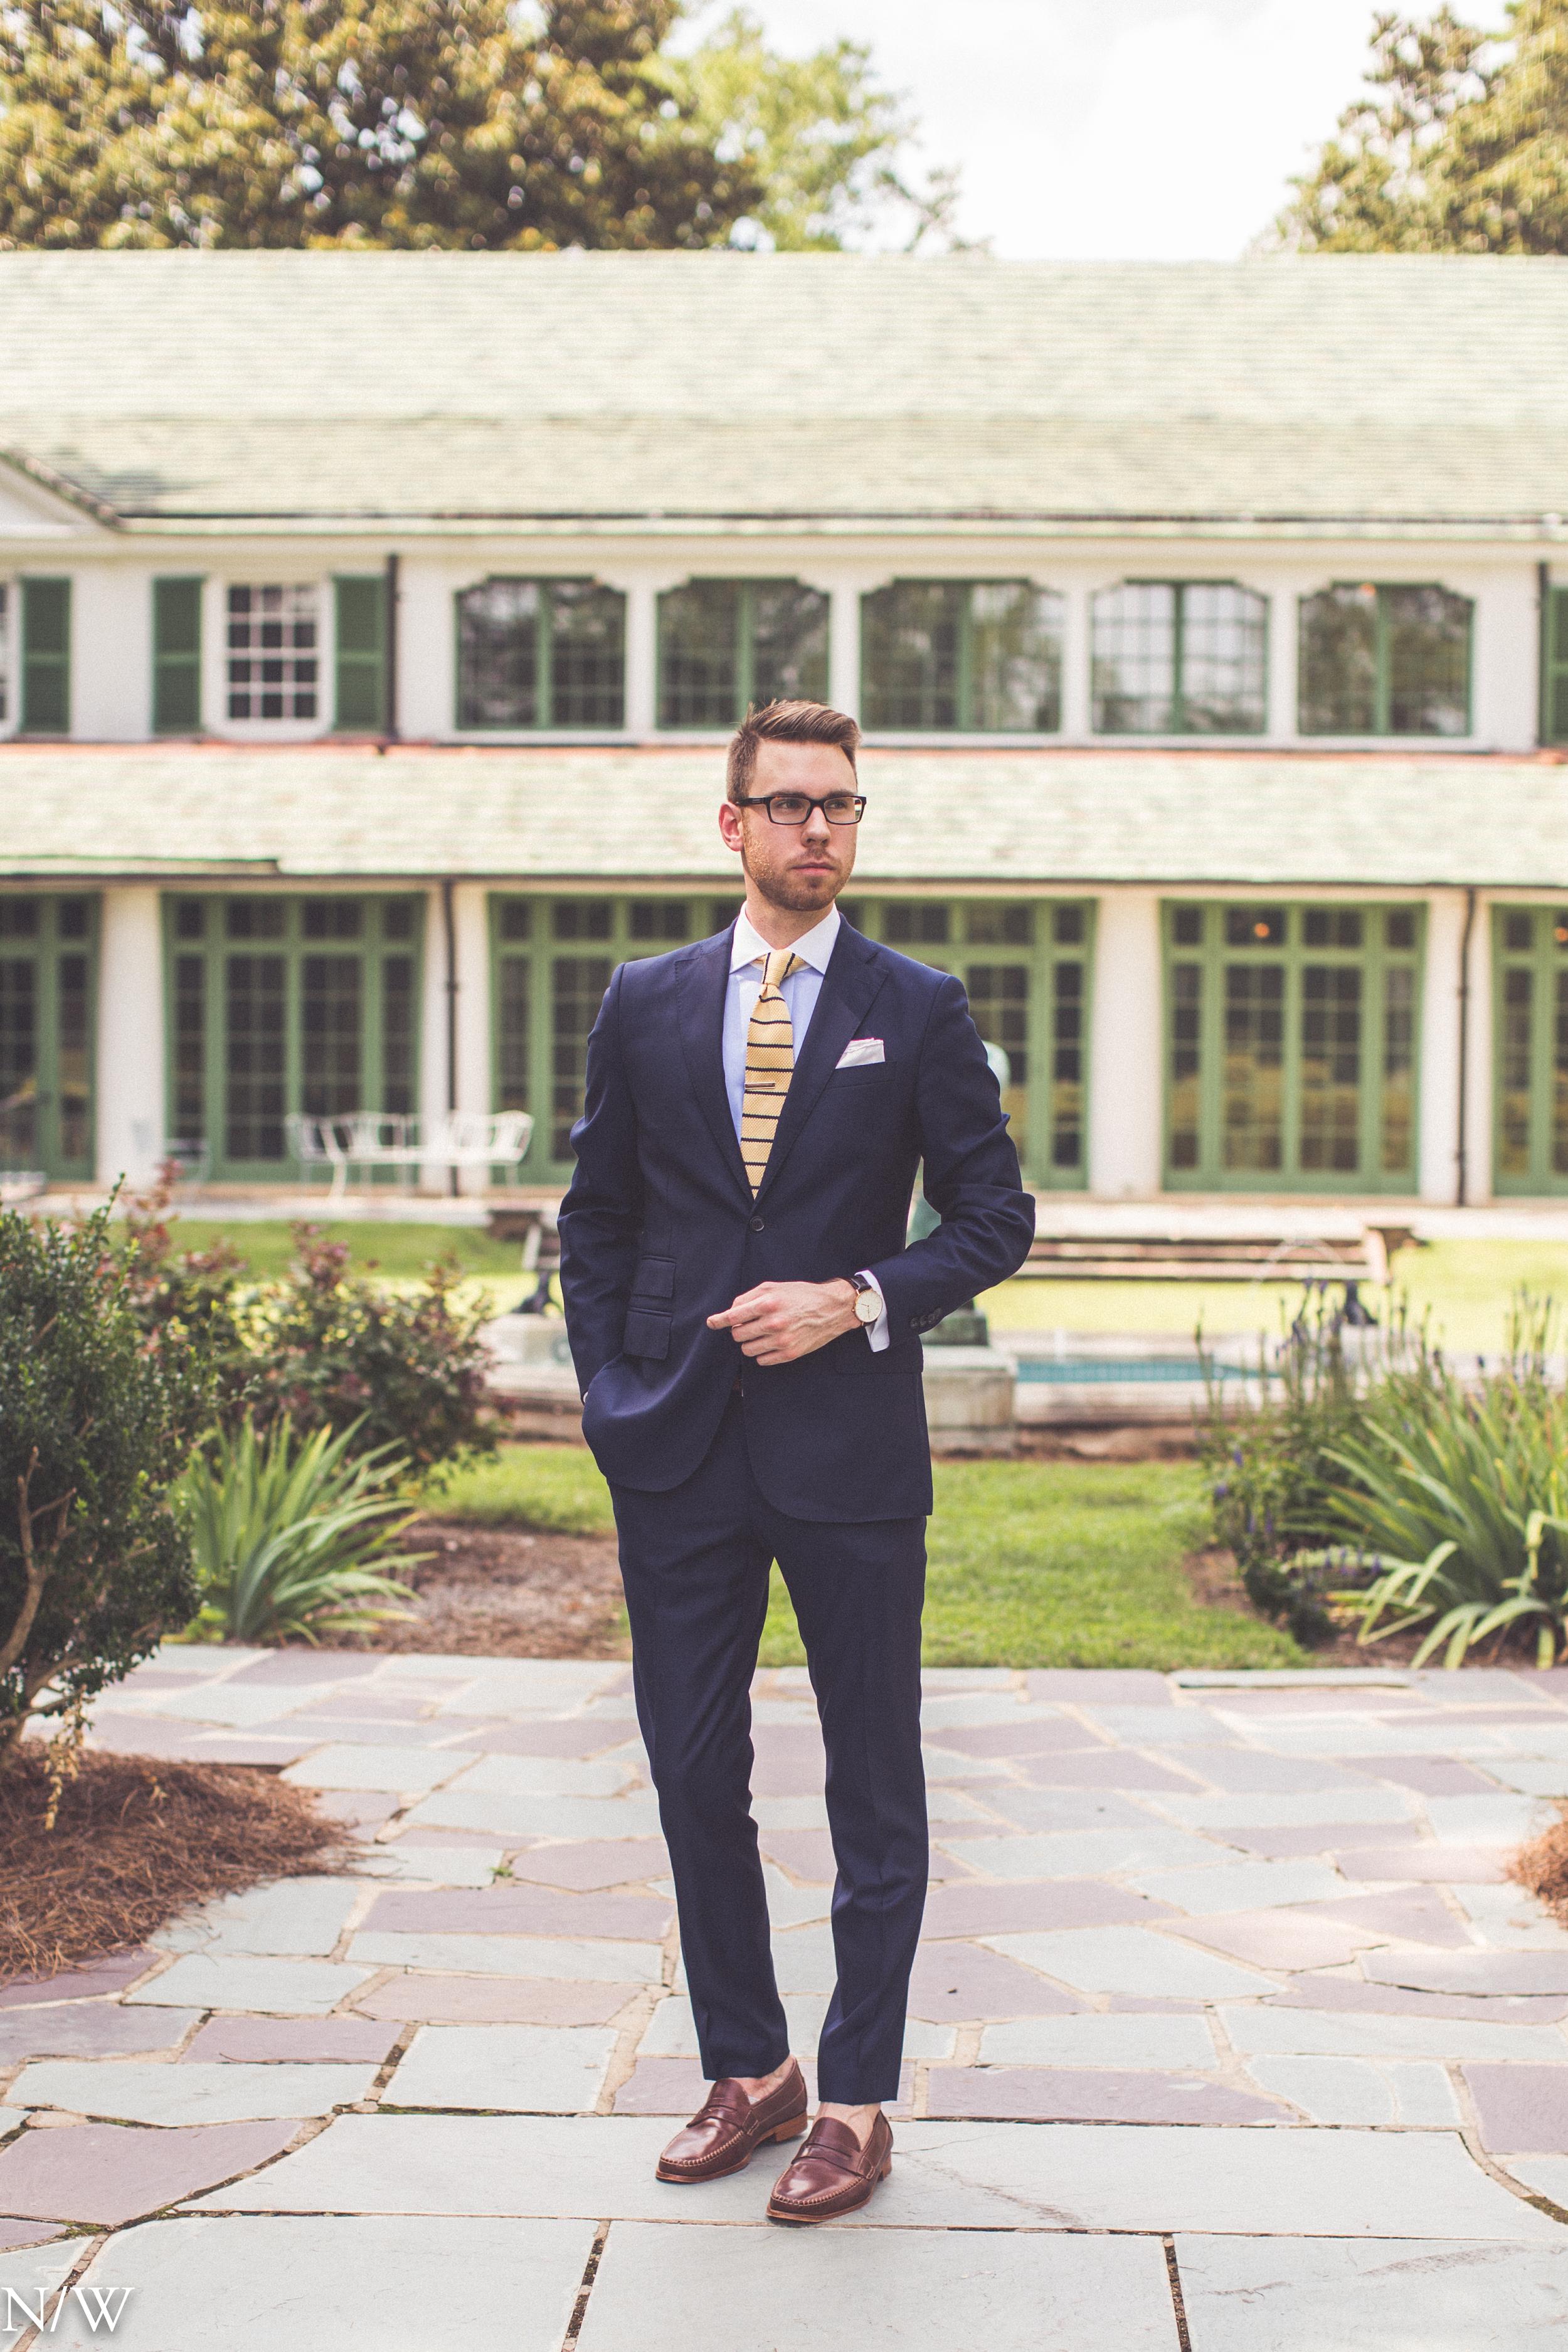 Suit: J. Lindeburg, Shirt: Ledbury, Shoes: Johnston & Murphy, Tie: Bows-n-ties.com, Glasses: Burberry.